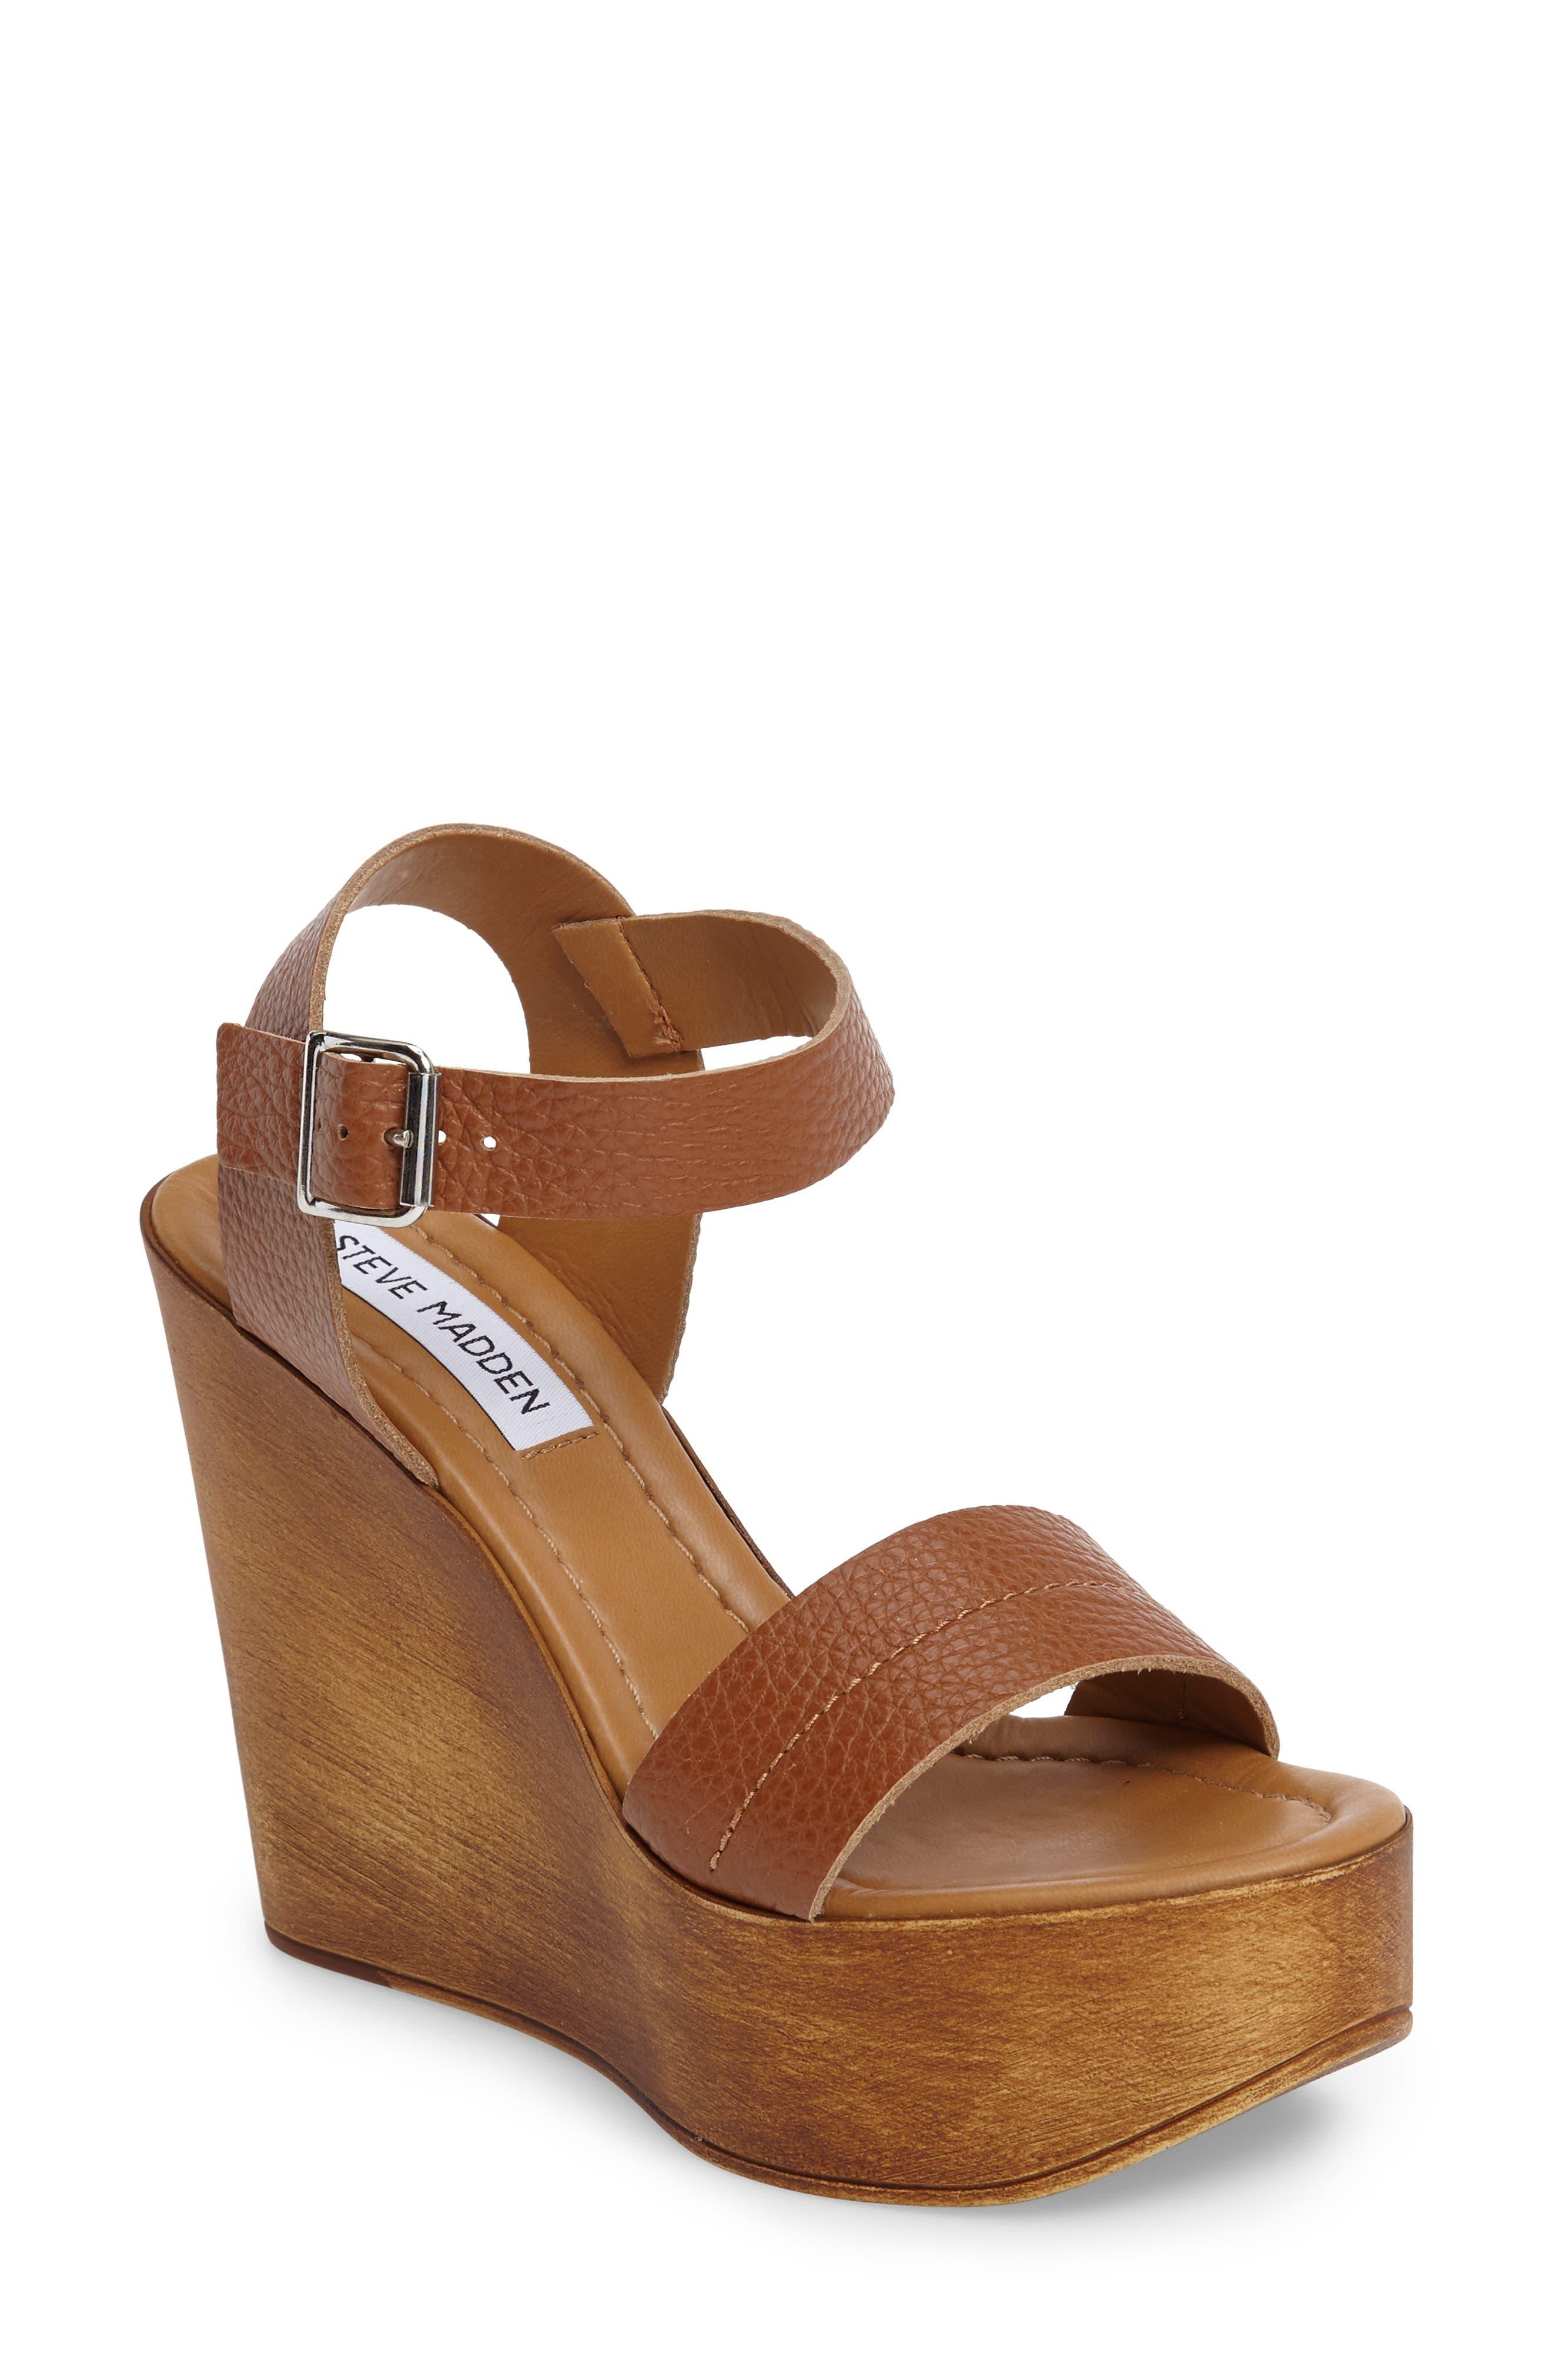 Belma Wedge Sandal,                             Main thumbnail 3, color,